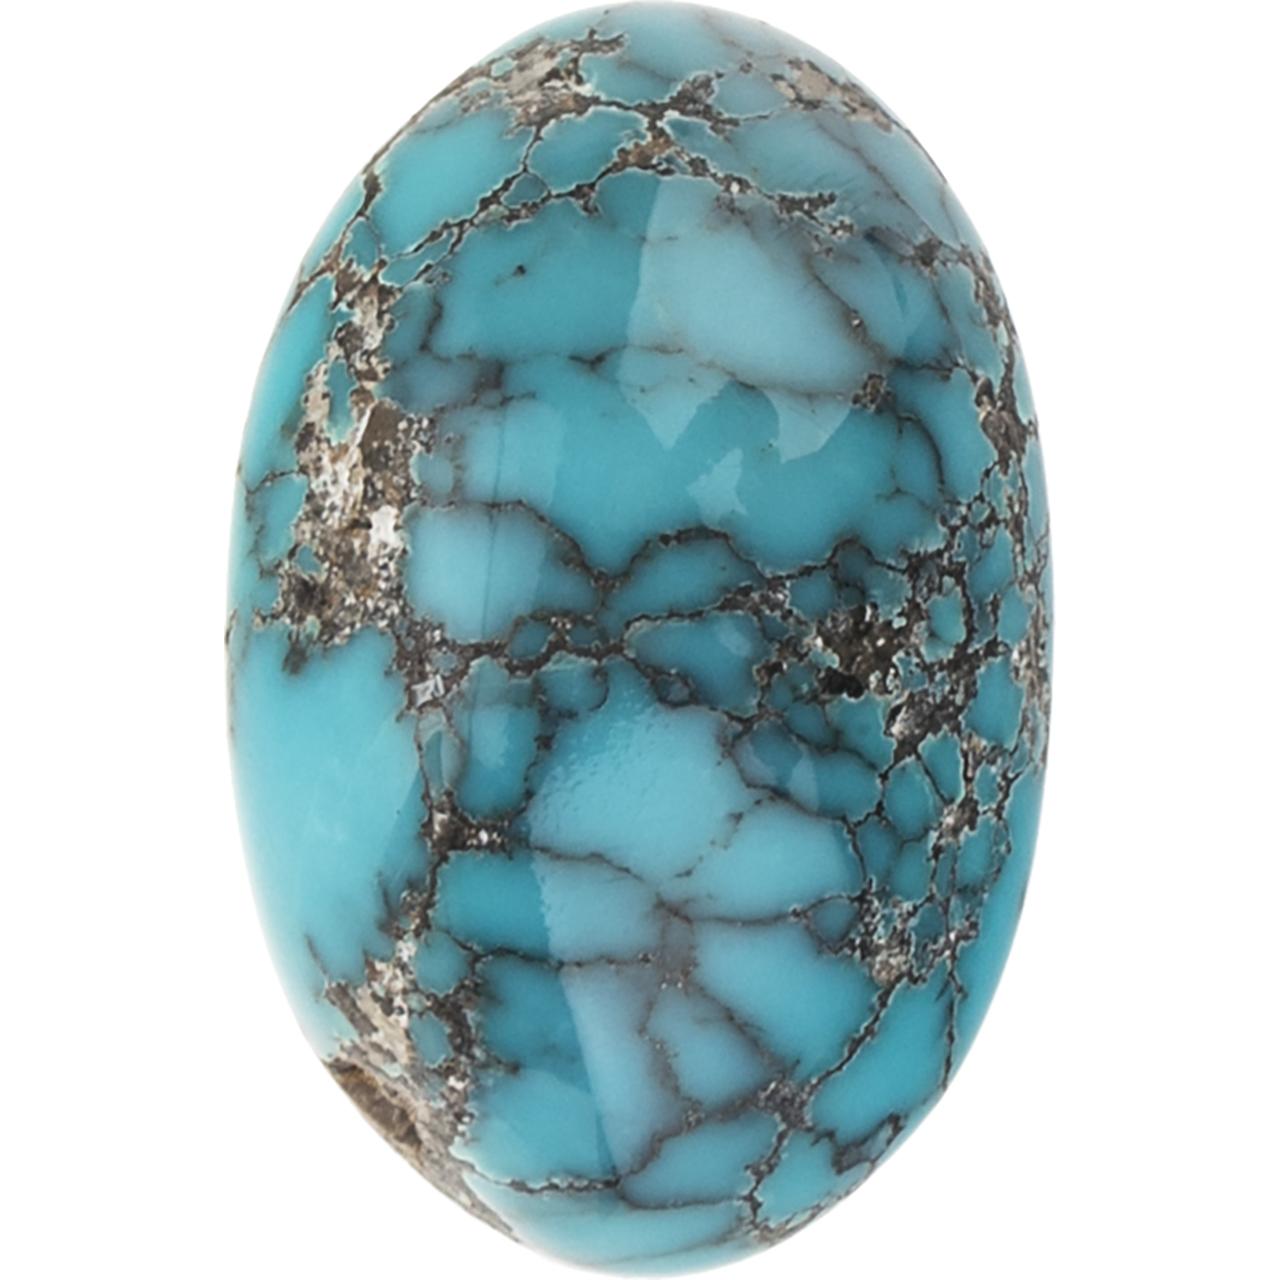 سنگ فیروزه شجر نیشابور کد GN7705